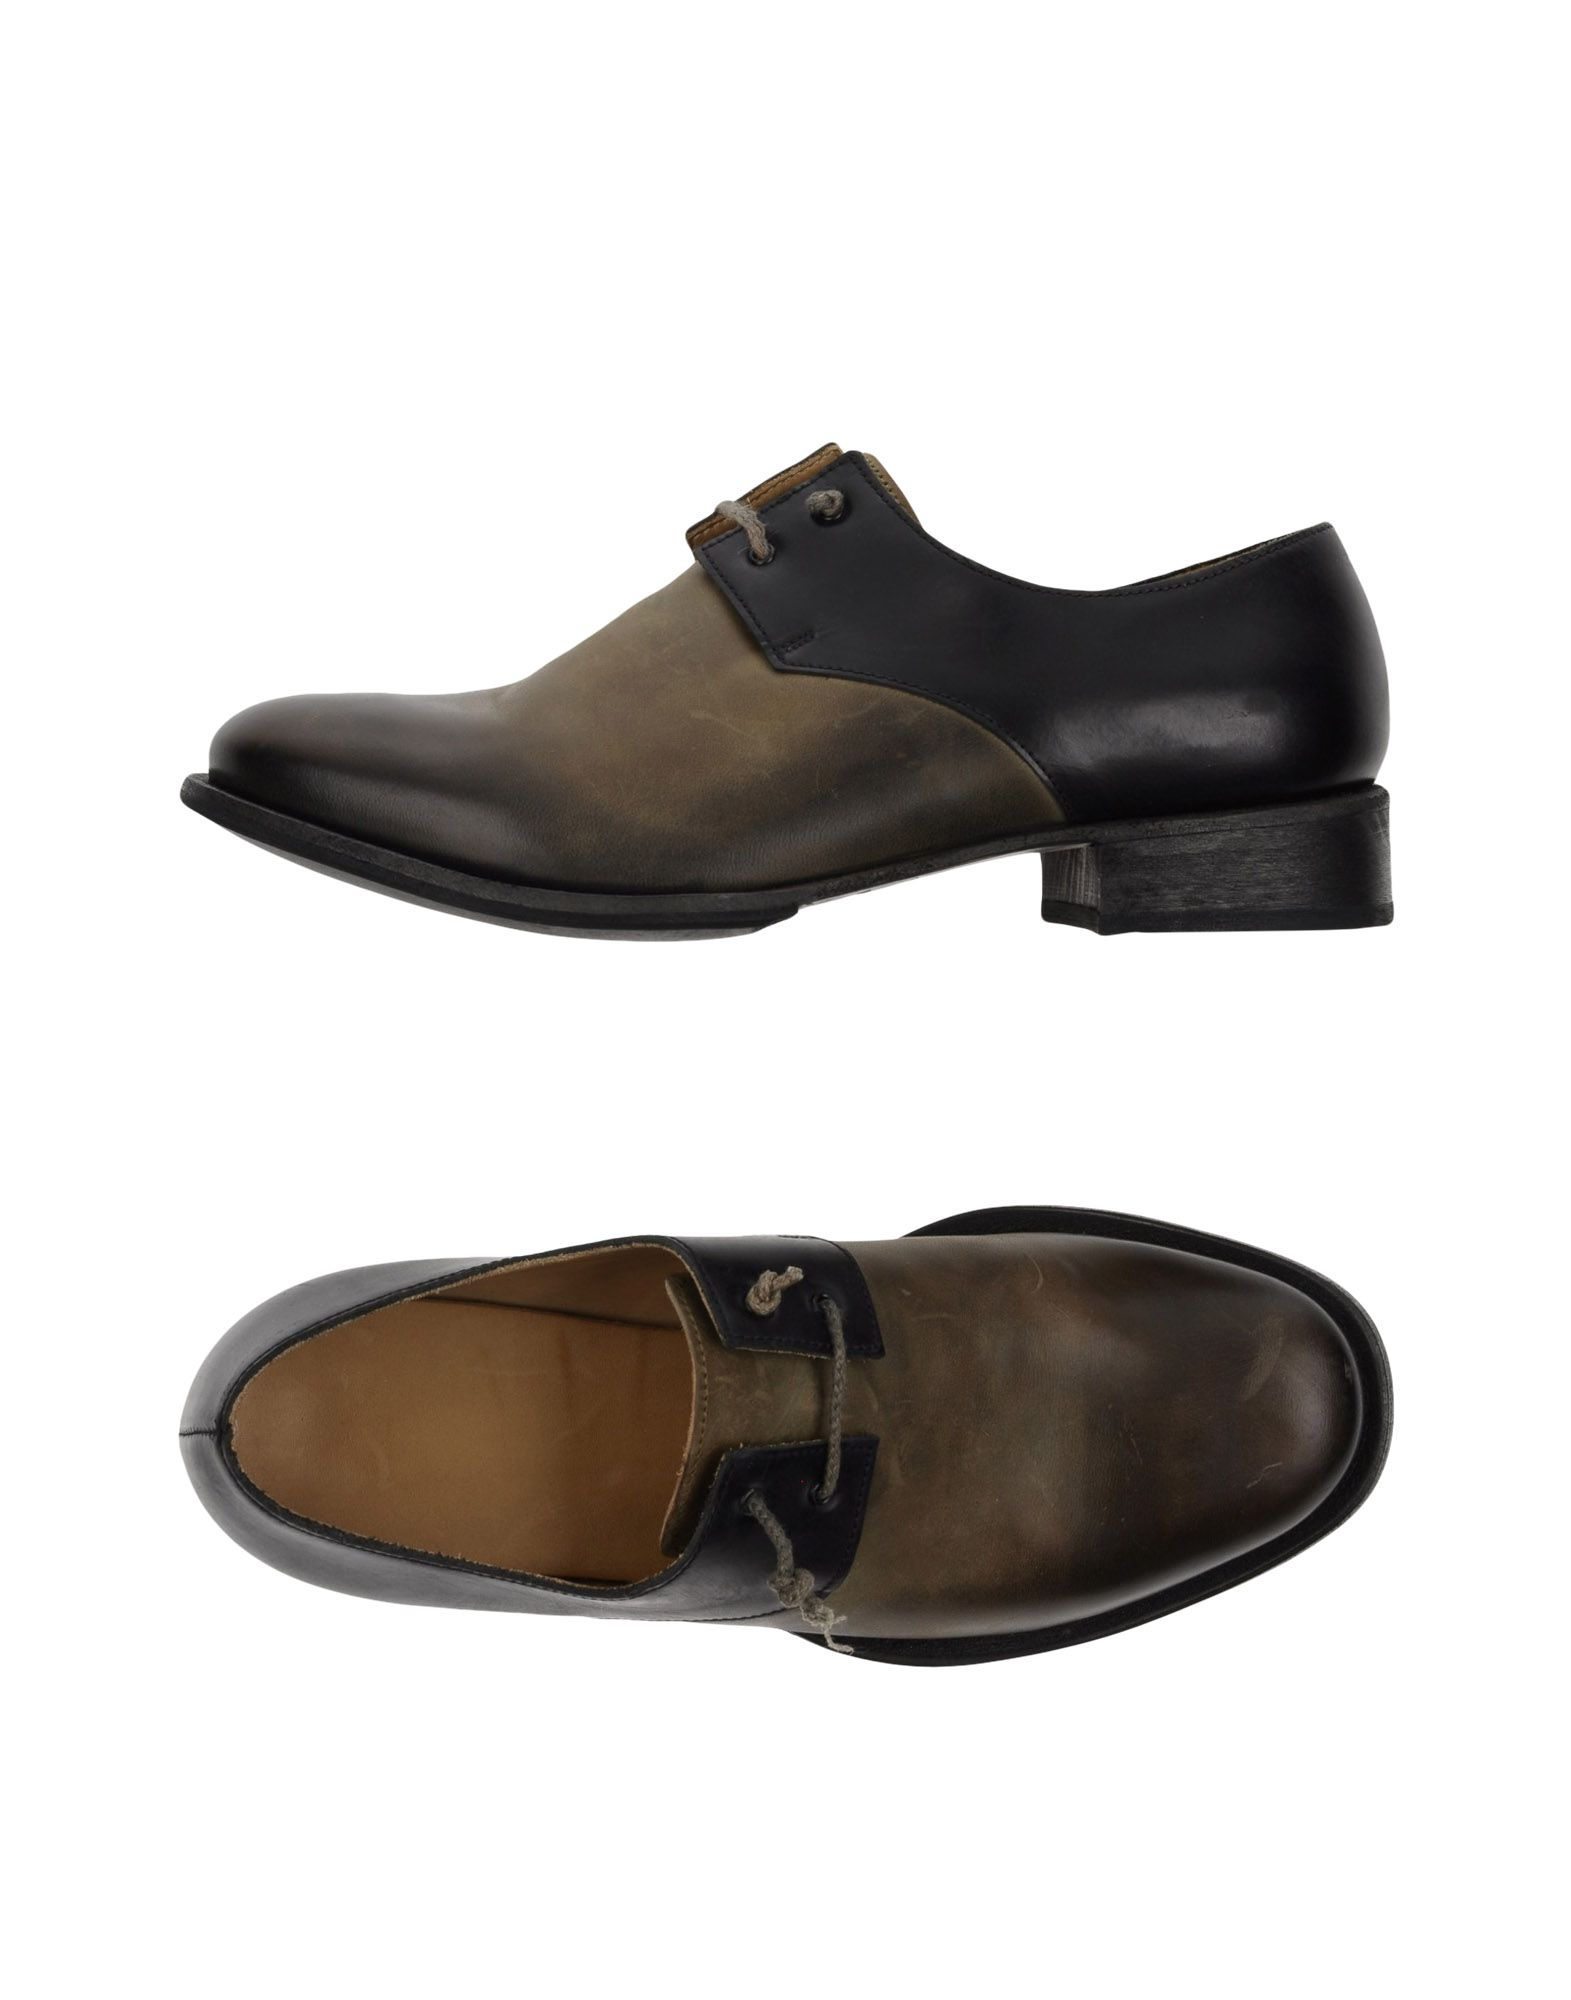 Cherevichkiotvichki For Yohji Yamamoto Schnürschuhe Damen  11358685XT Heiße Schuhe